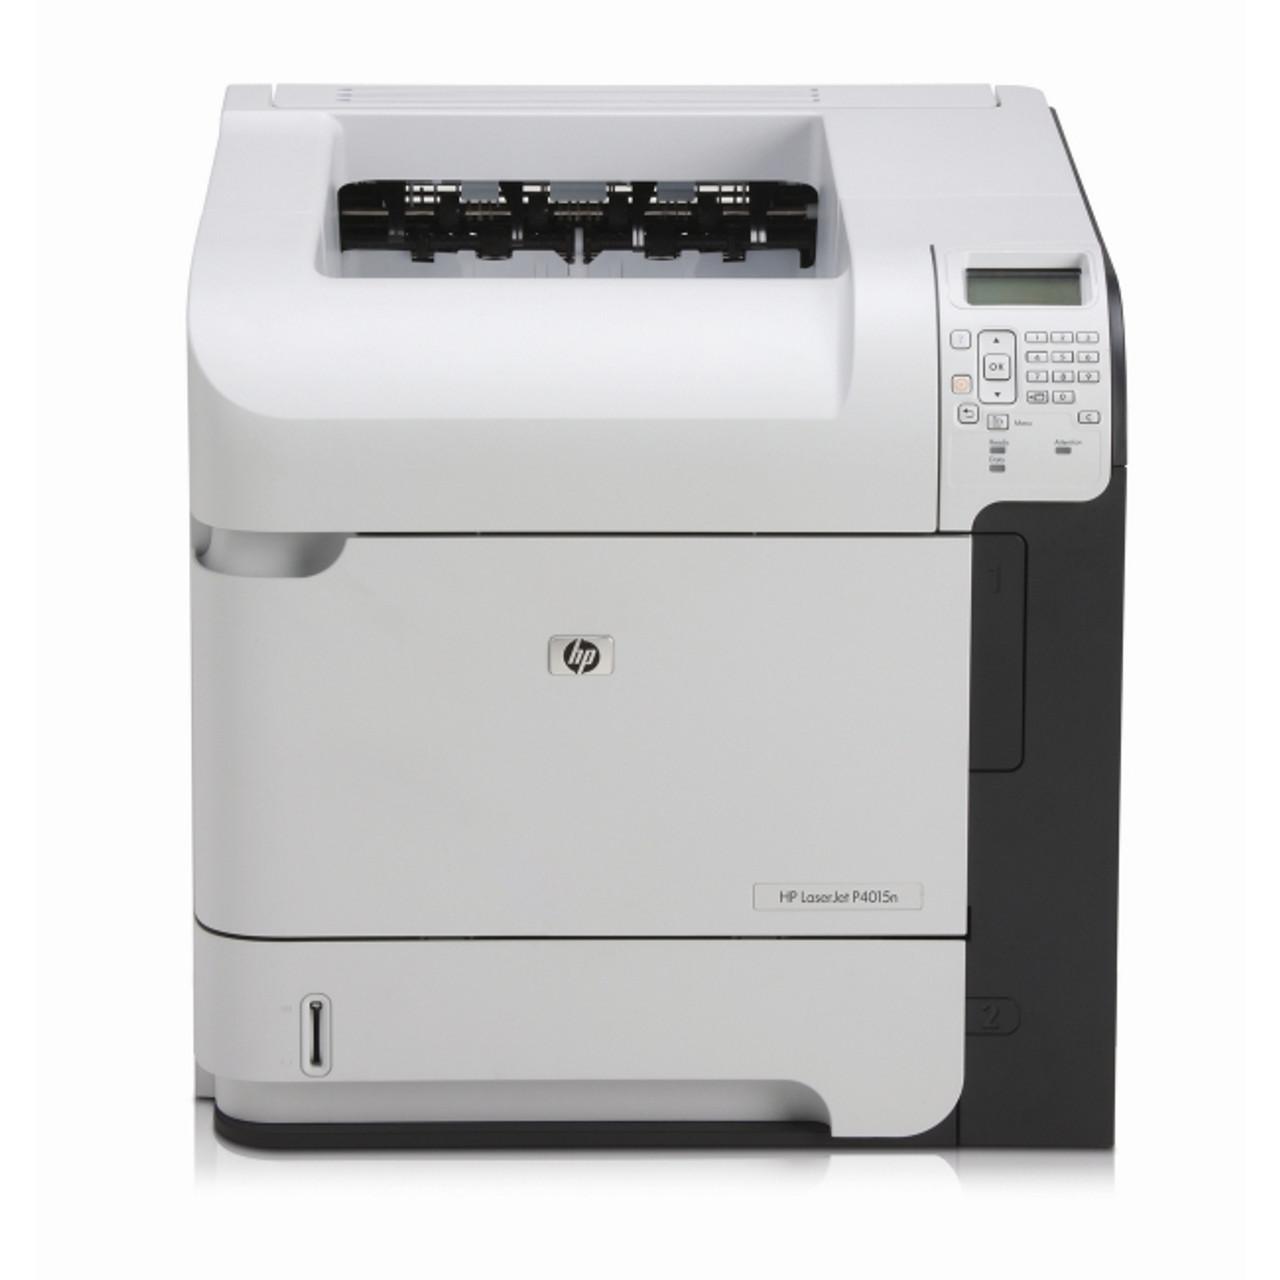 HP LaserJet P4015dn - CB526AR - HP Laser Printer for sale